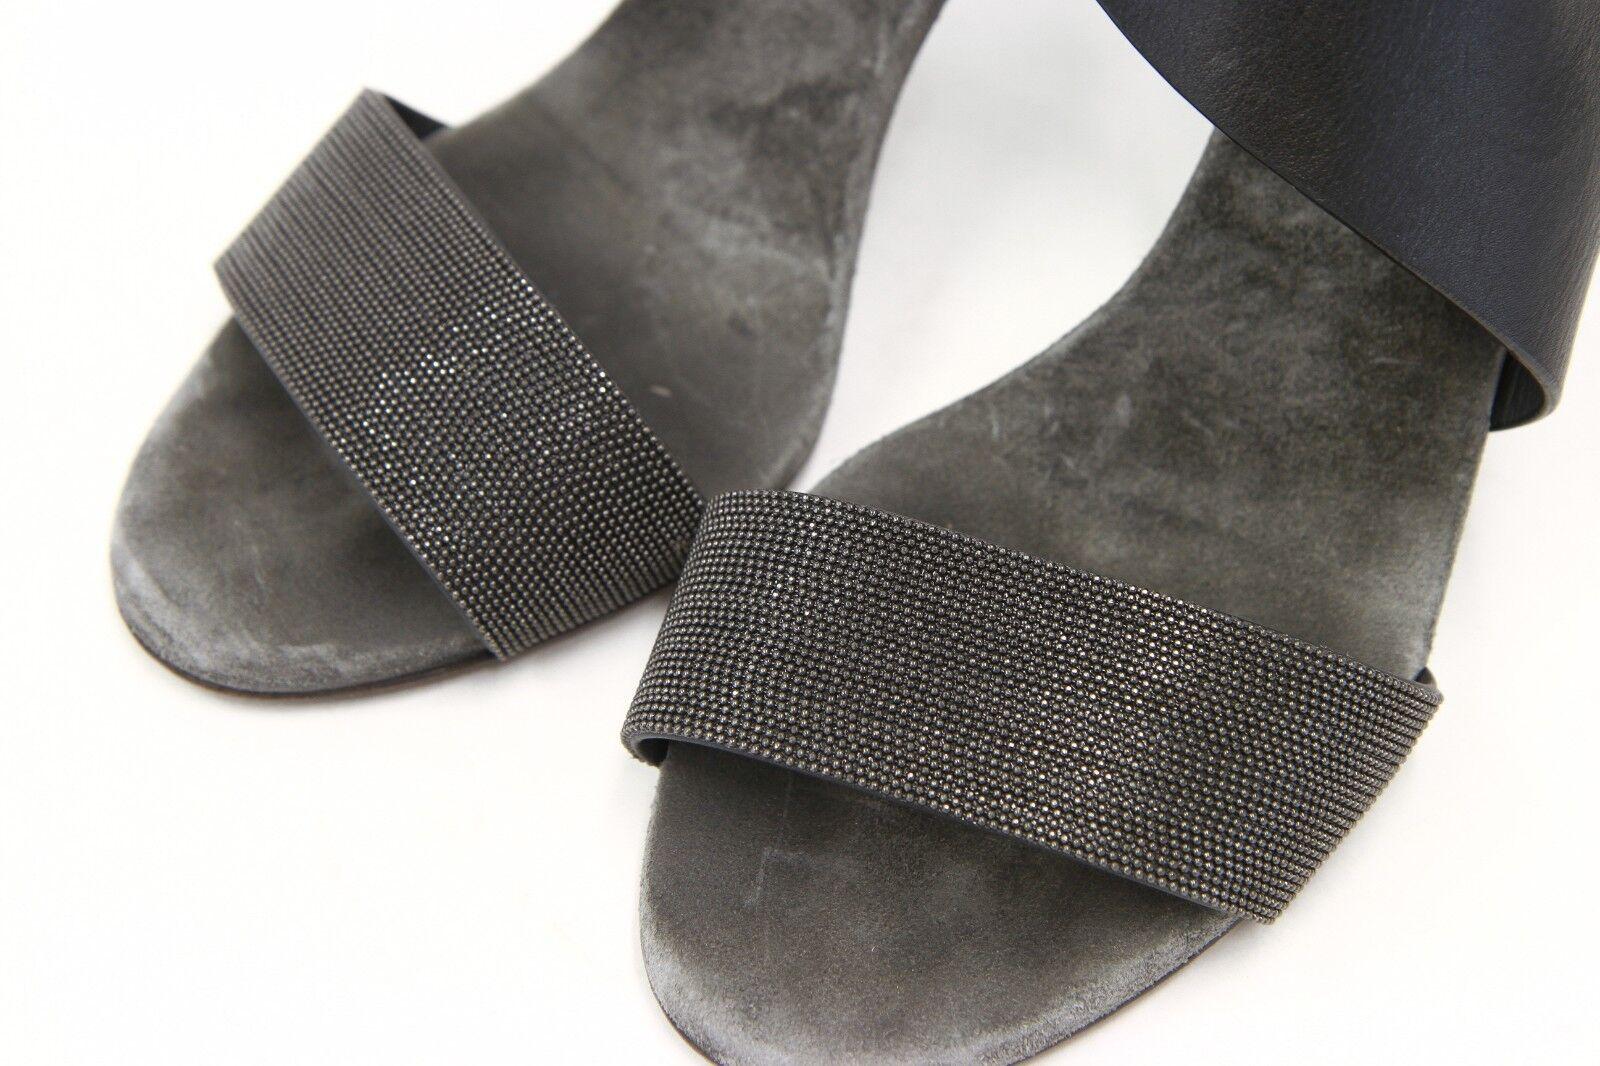 1395 Brunello Cucinelli 100% Leather Monili Beaded Beaded Beaded Sandal Size 40  10 US A181 f9701d